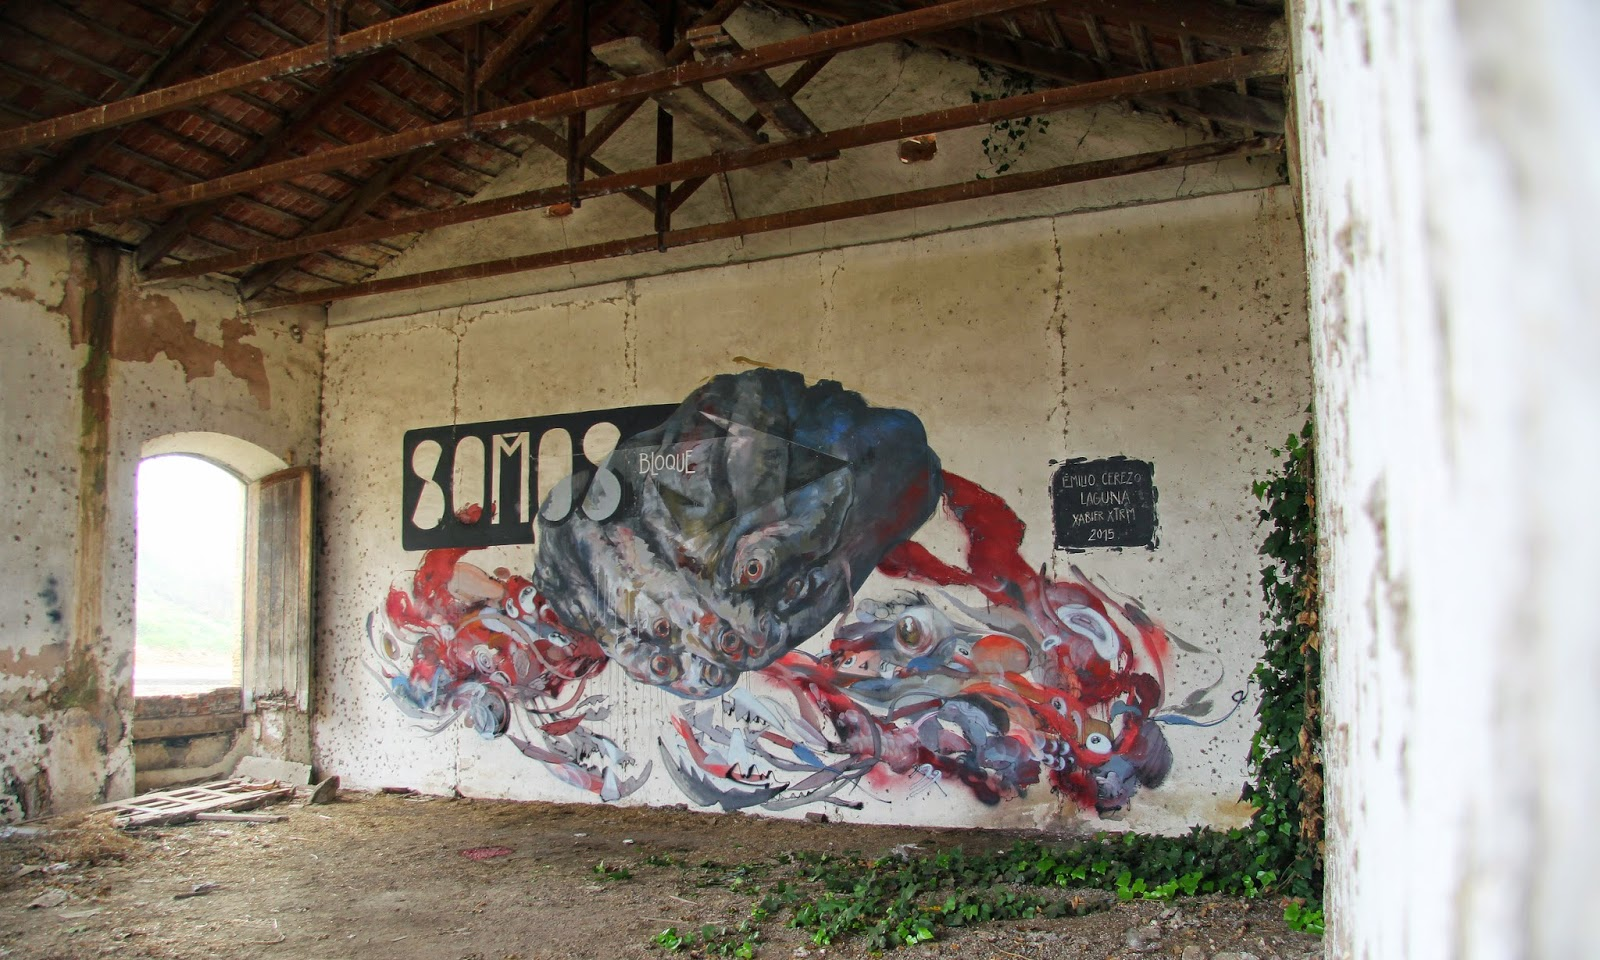 laguna-emilio-cerezo-xabier-xtrm-new-mural-05